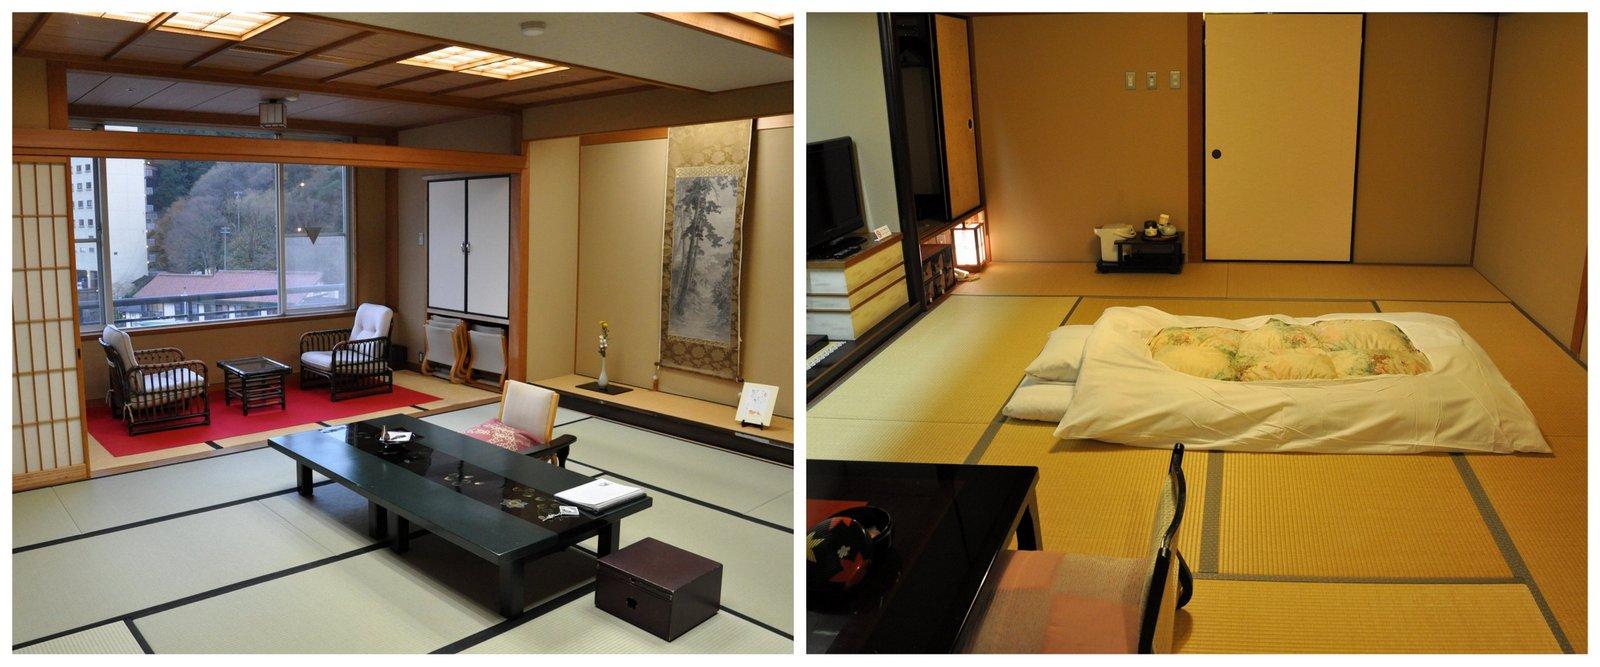 Une chambre de ryokan avec futon et tatami